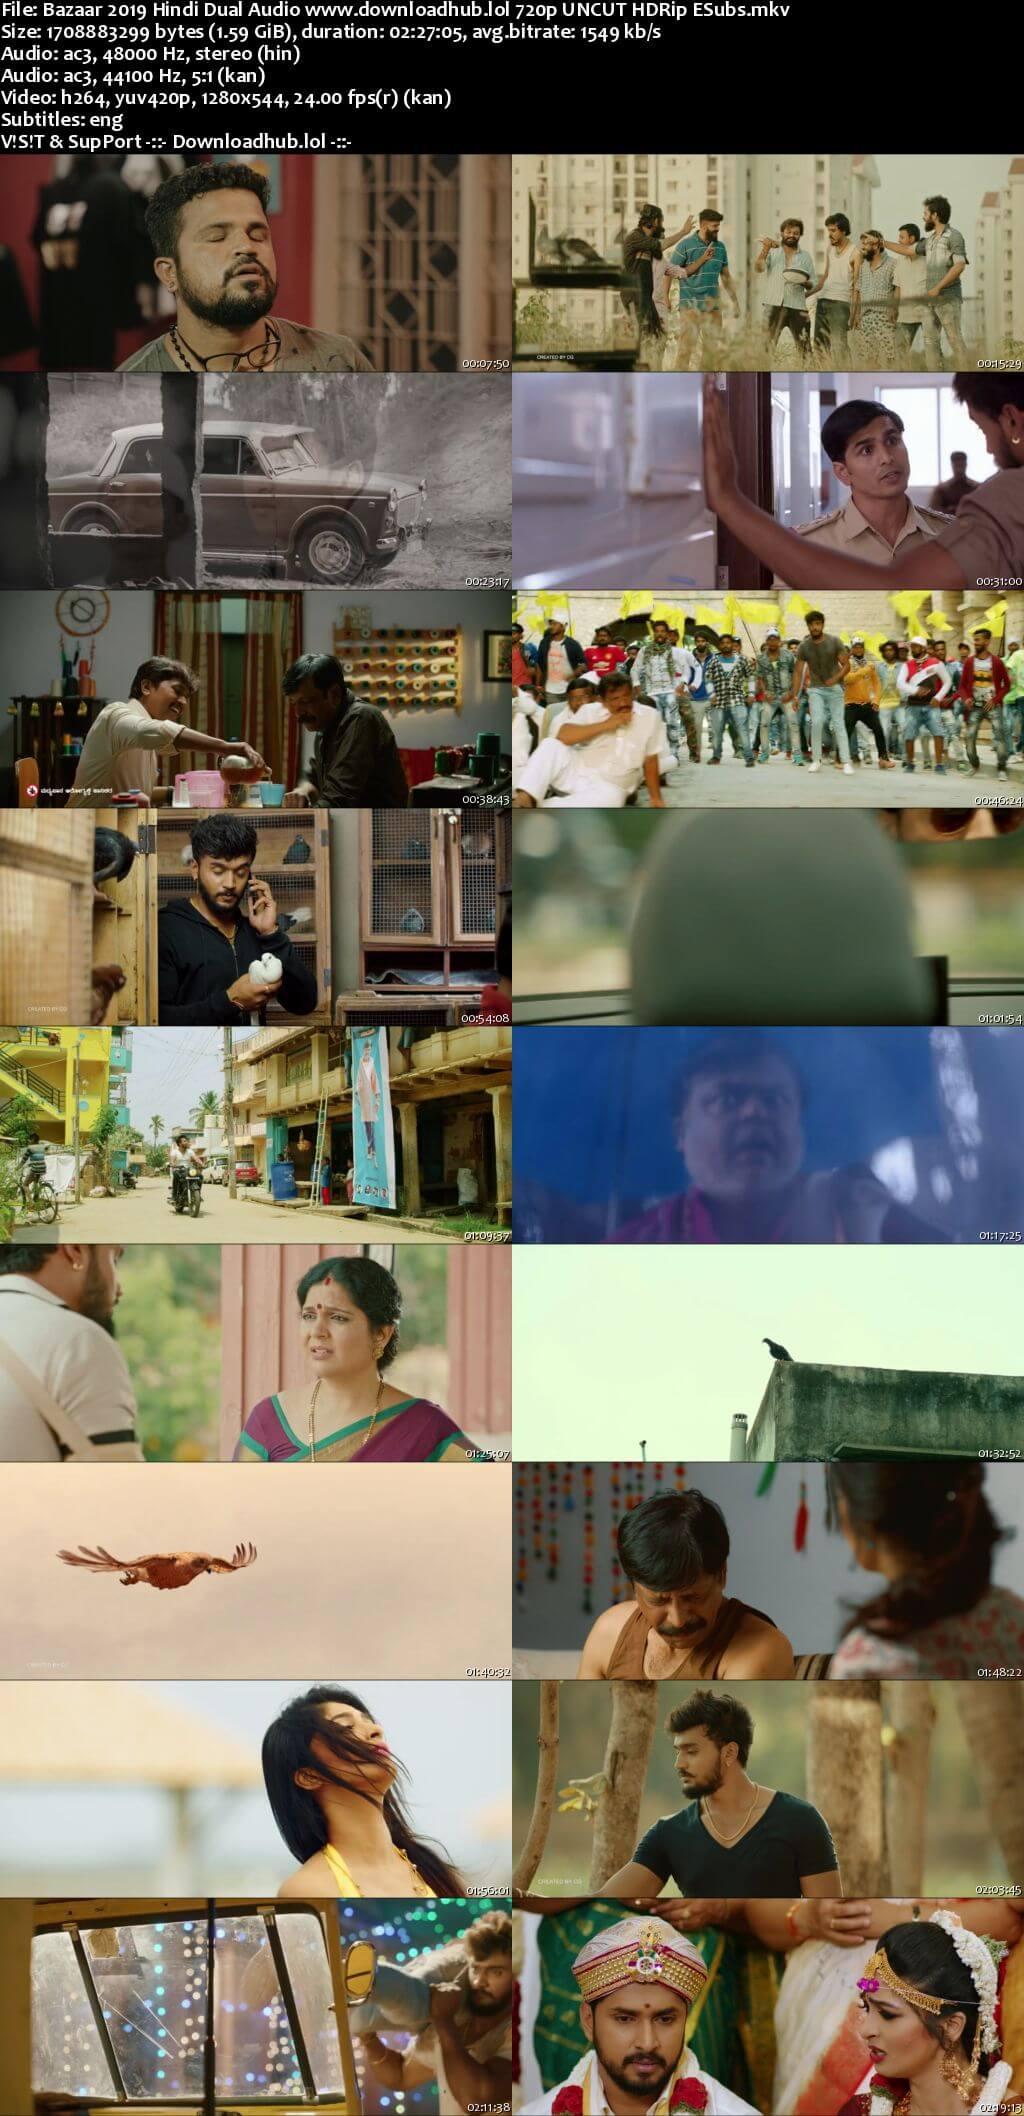 Bazaar 2019 Hindi Dual Audio 720p UNCUT HDRip ESubs